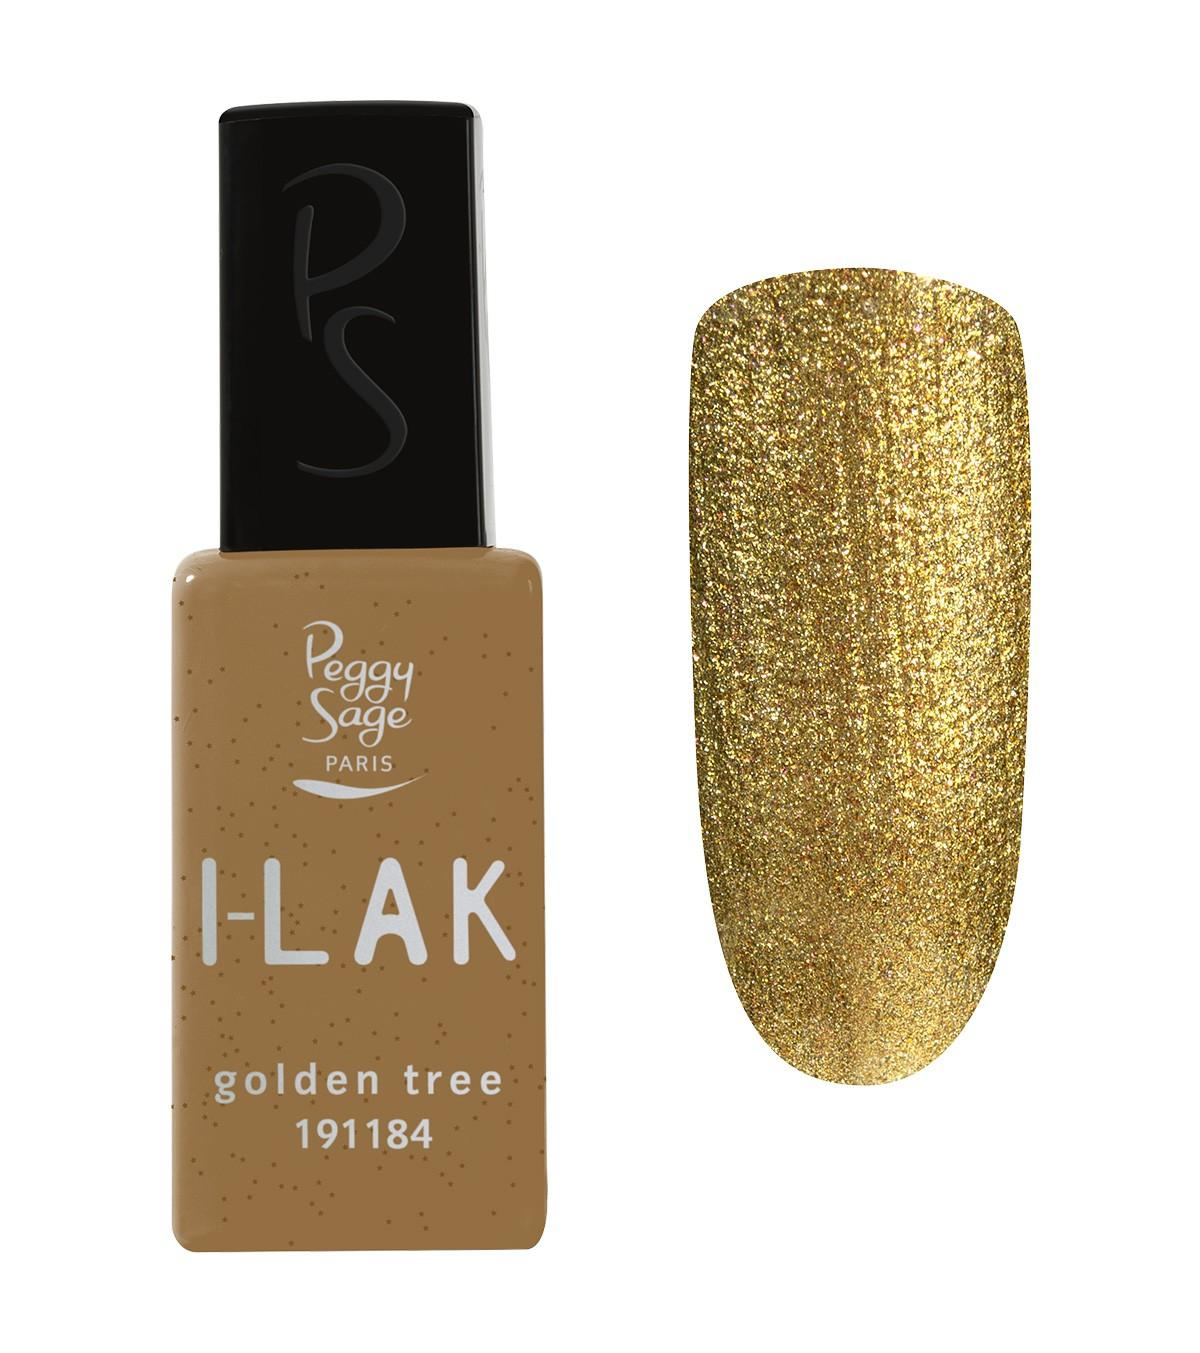 I-LAK Golden tree